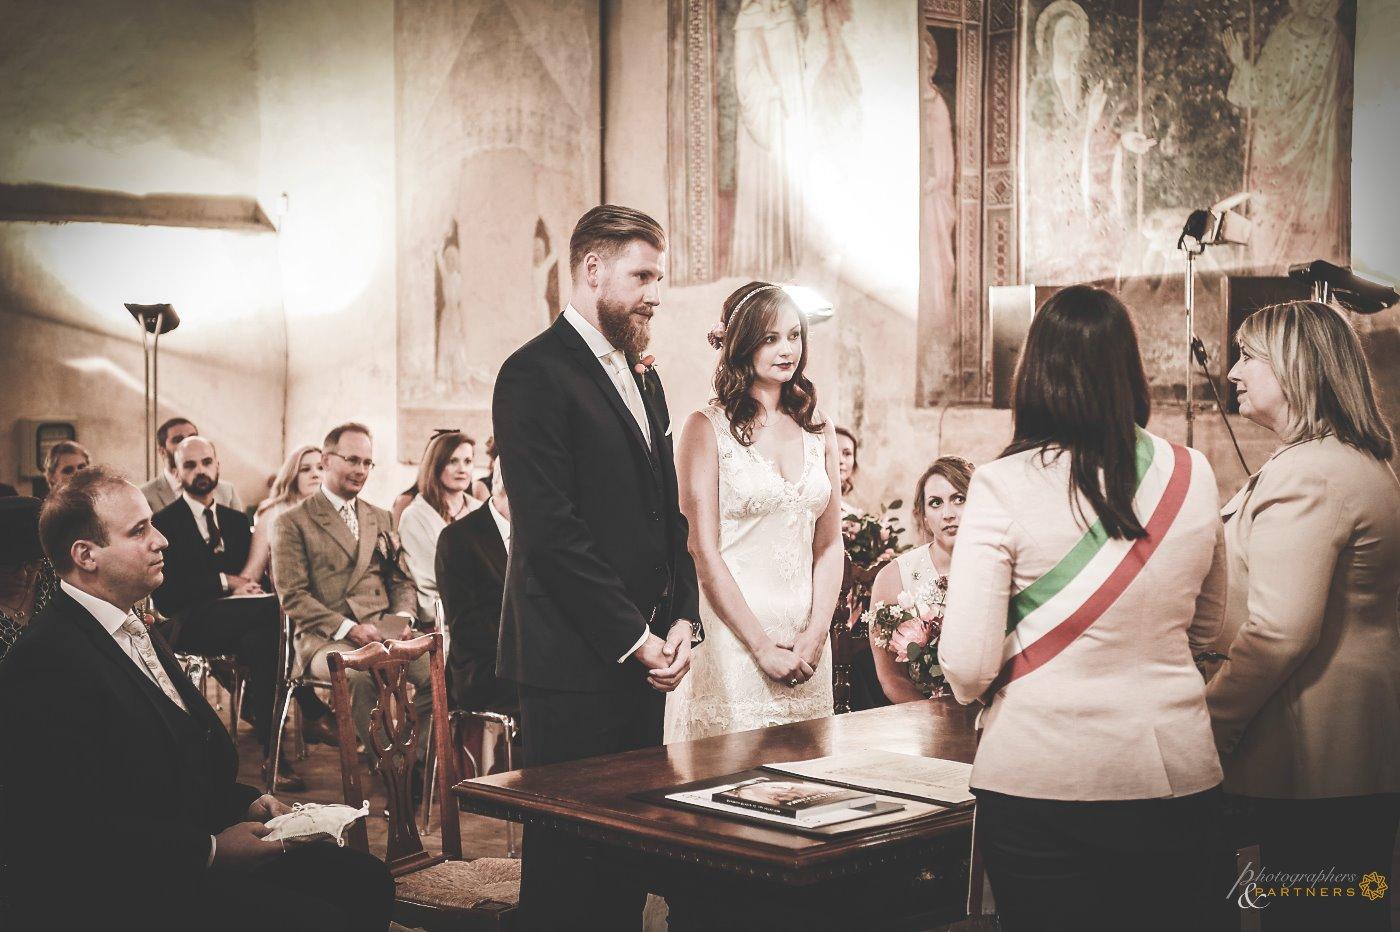 photos_weddings_castello_oliveto_09.jpg